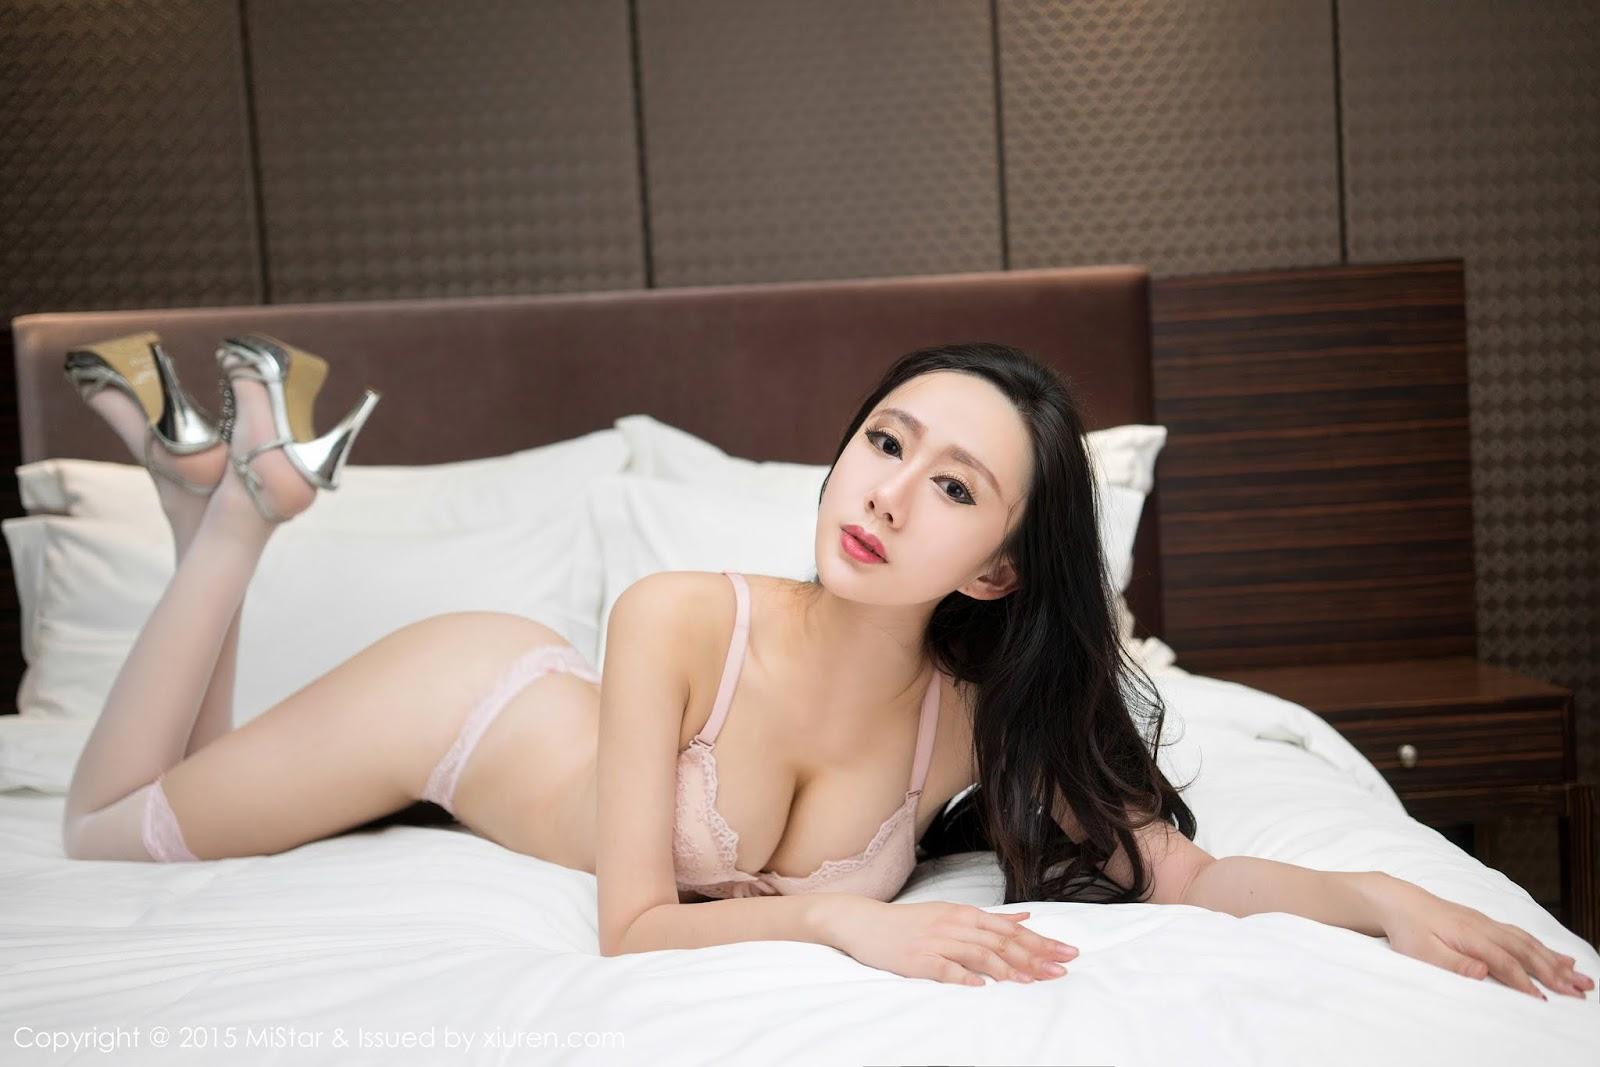 0011 - MiStar Vol.002 Model 苏小曼